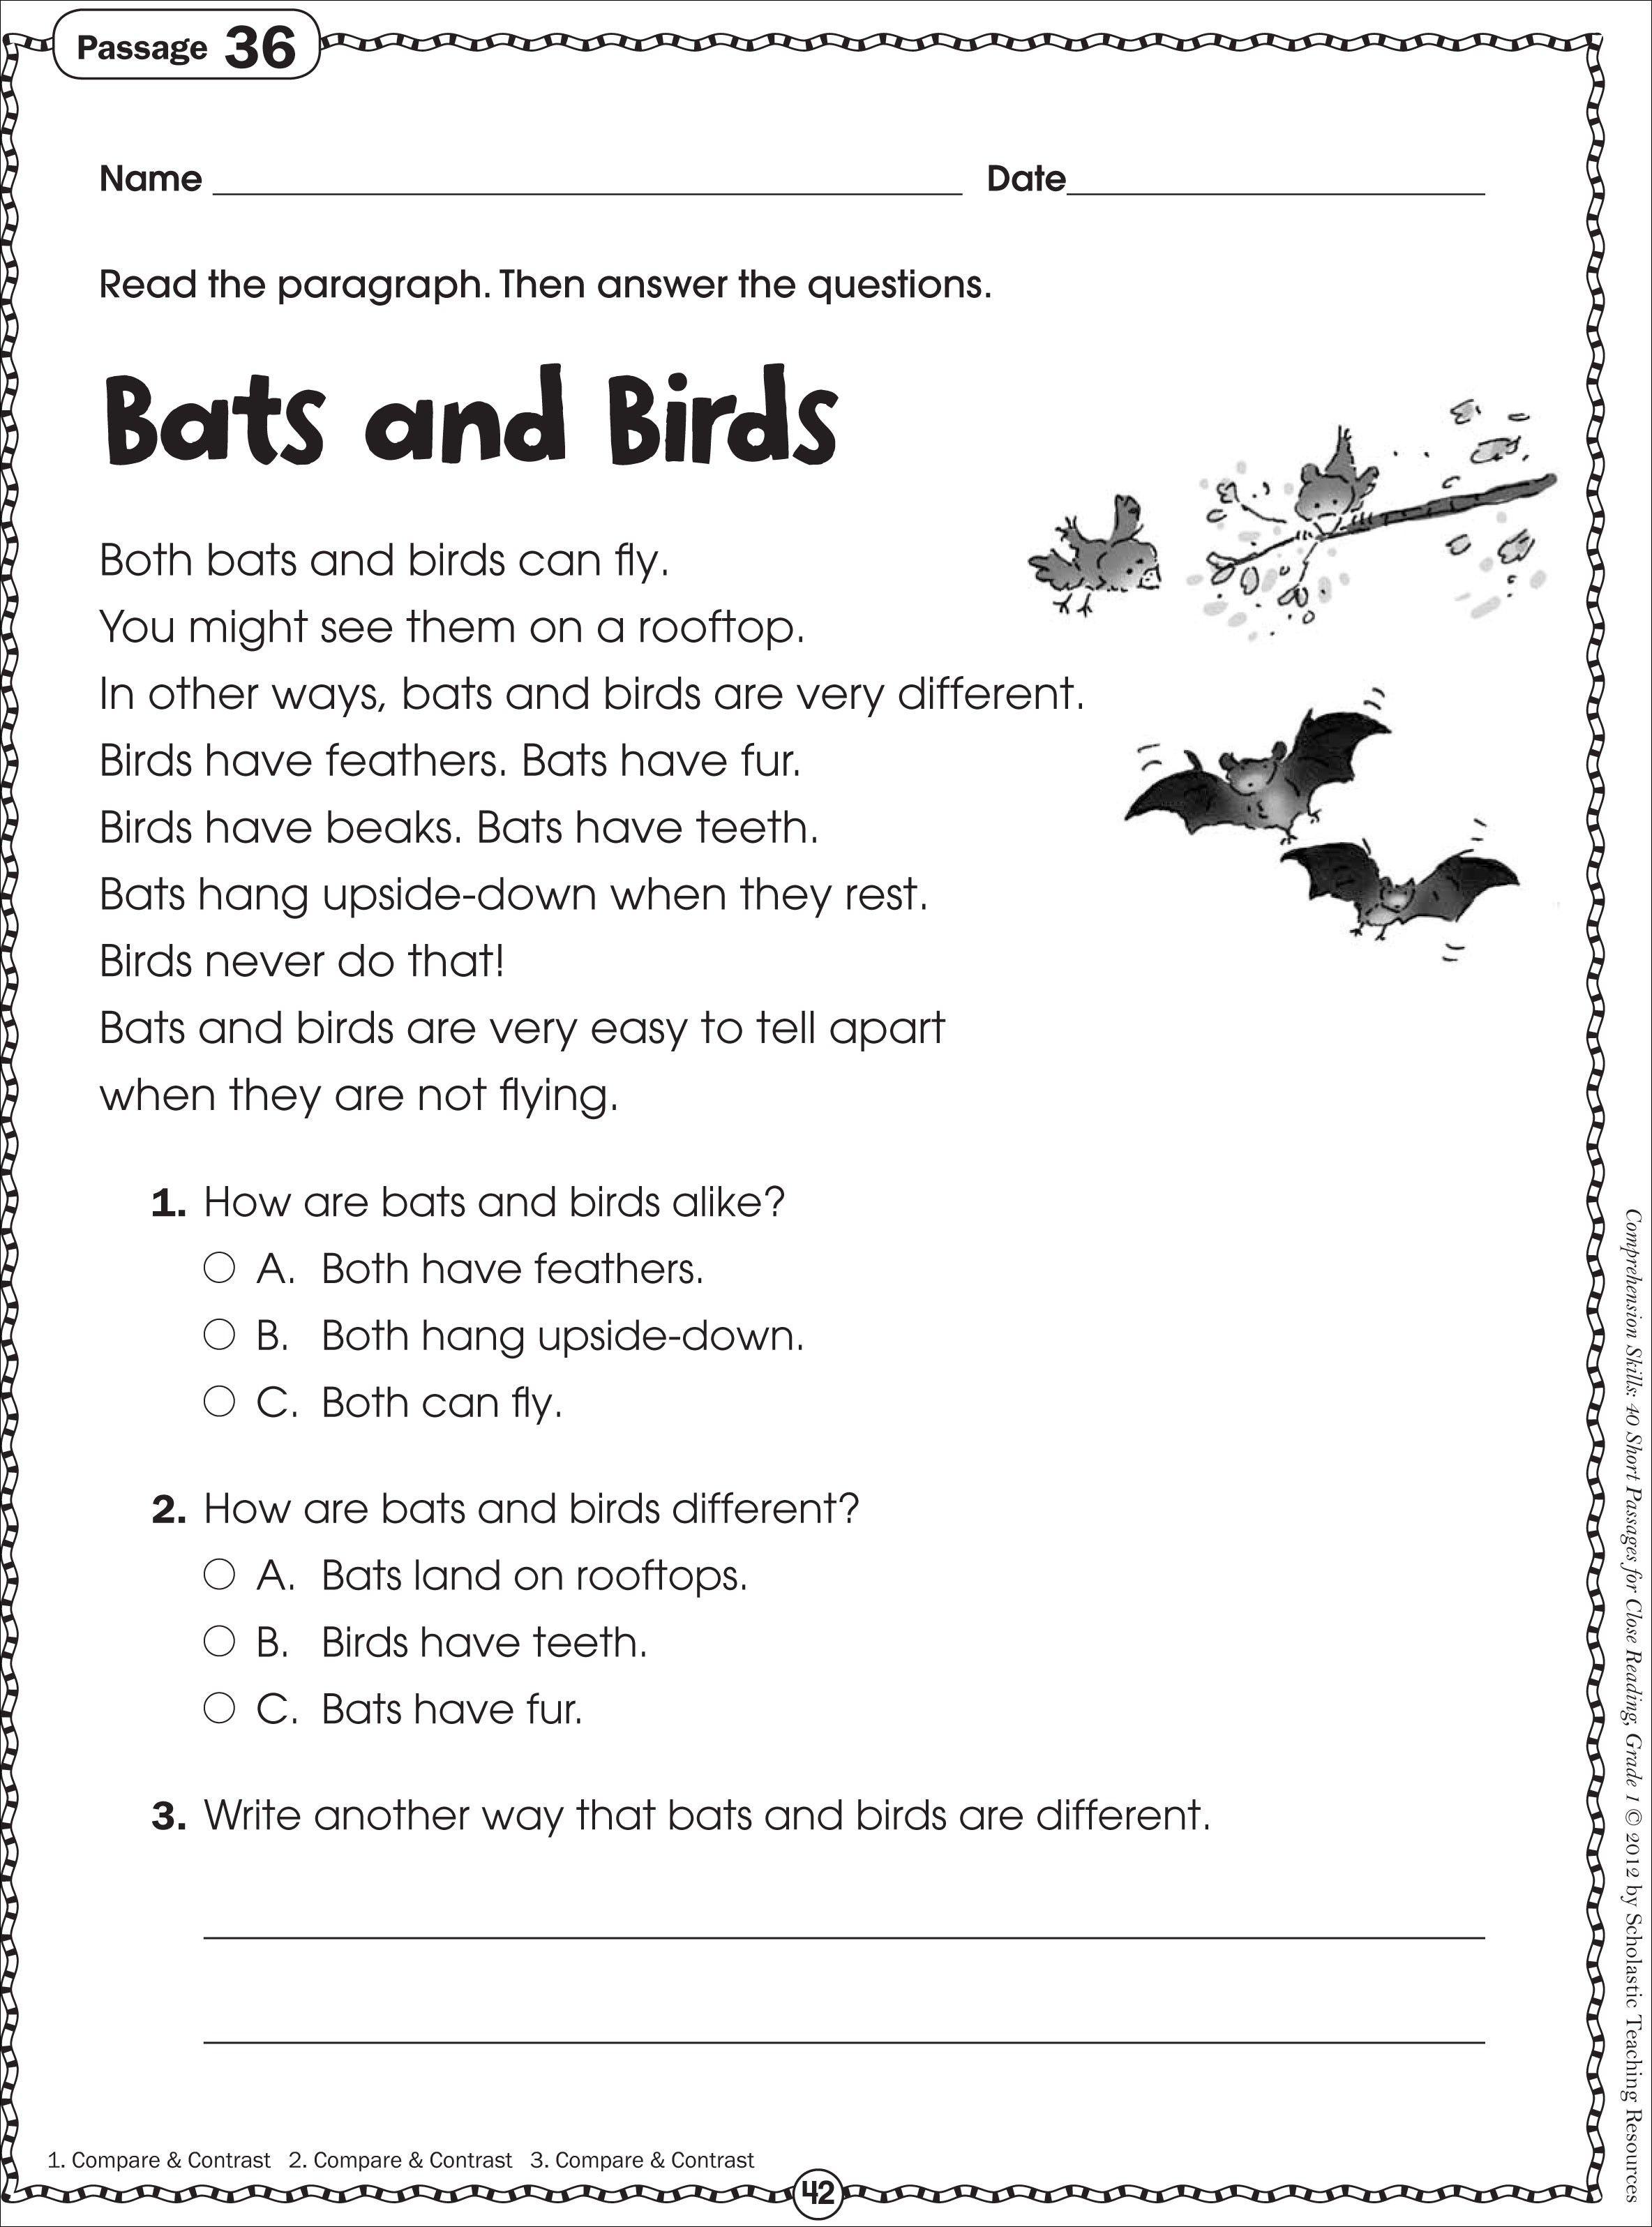 Free Printable Reading Comprehension Worksheets For Kindergarten - Free Printable Reading Comprehension Worksheets For 3Rd Grade